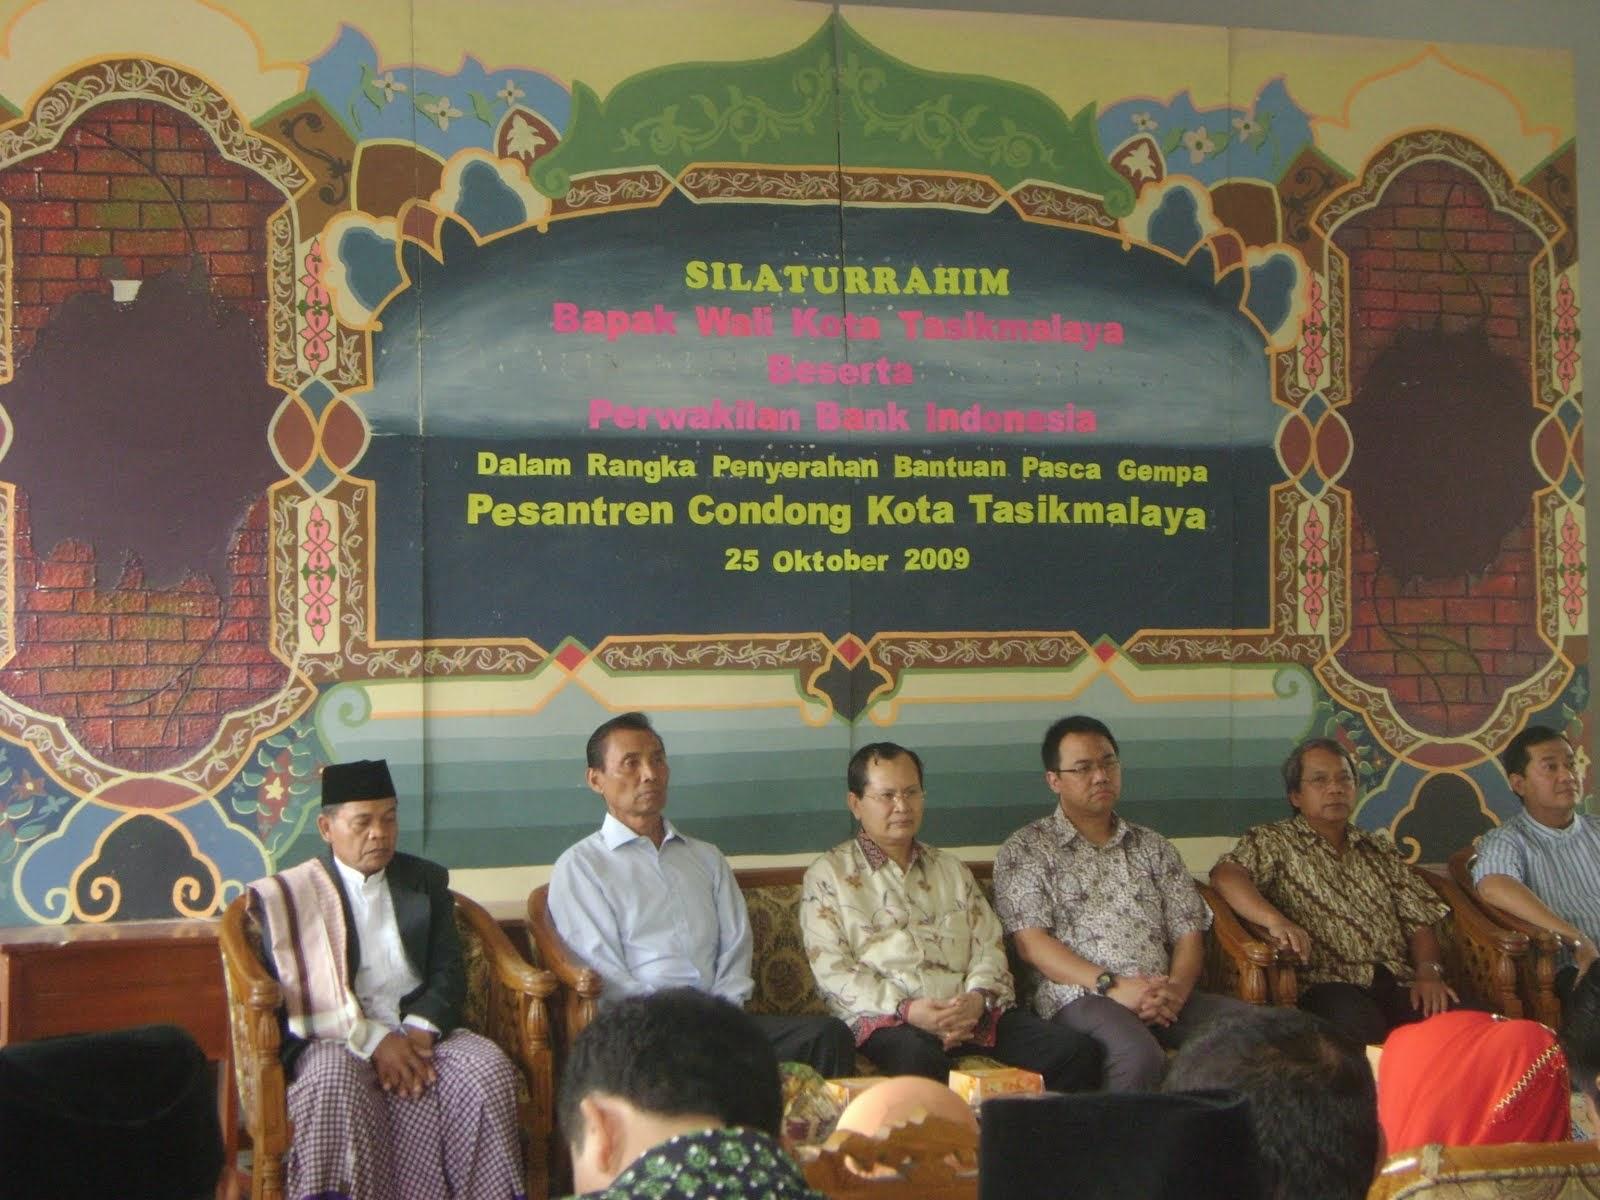 Wali Kota Tasikmalaya periode 2007-2012